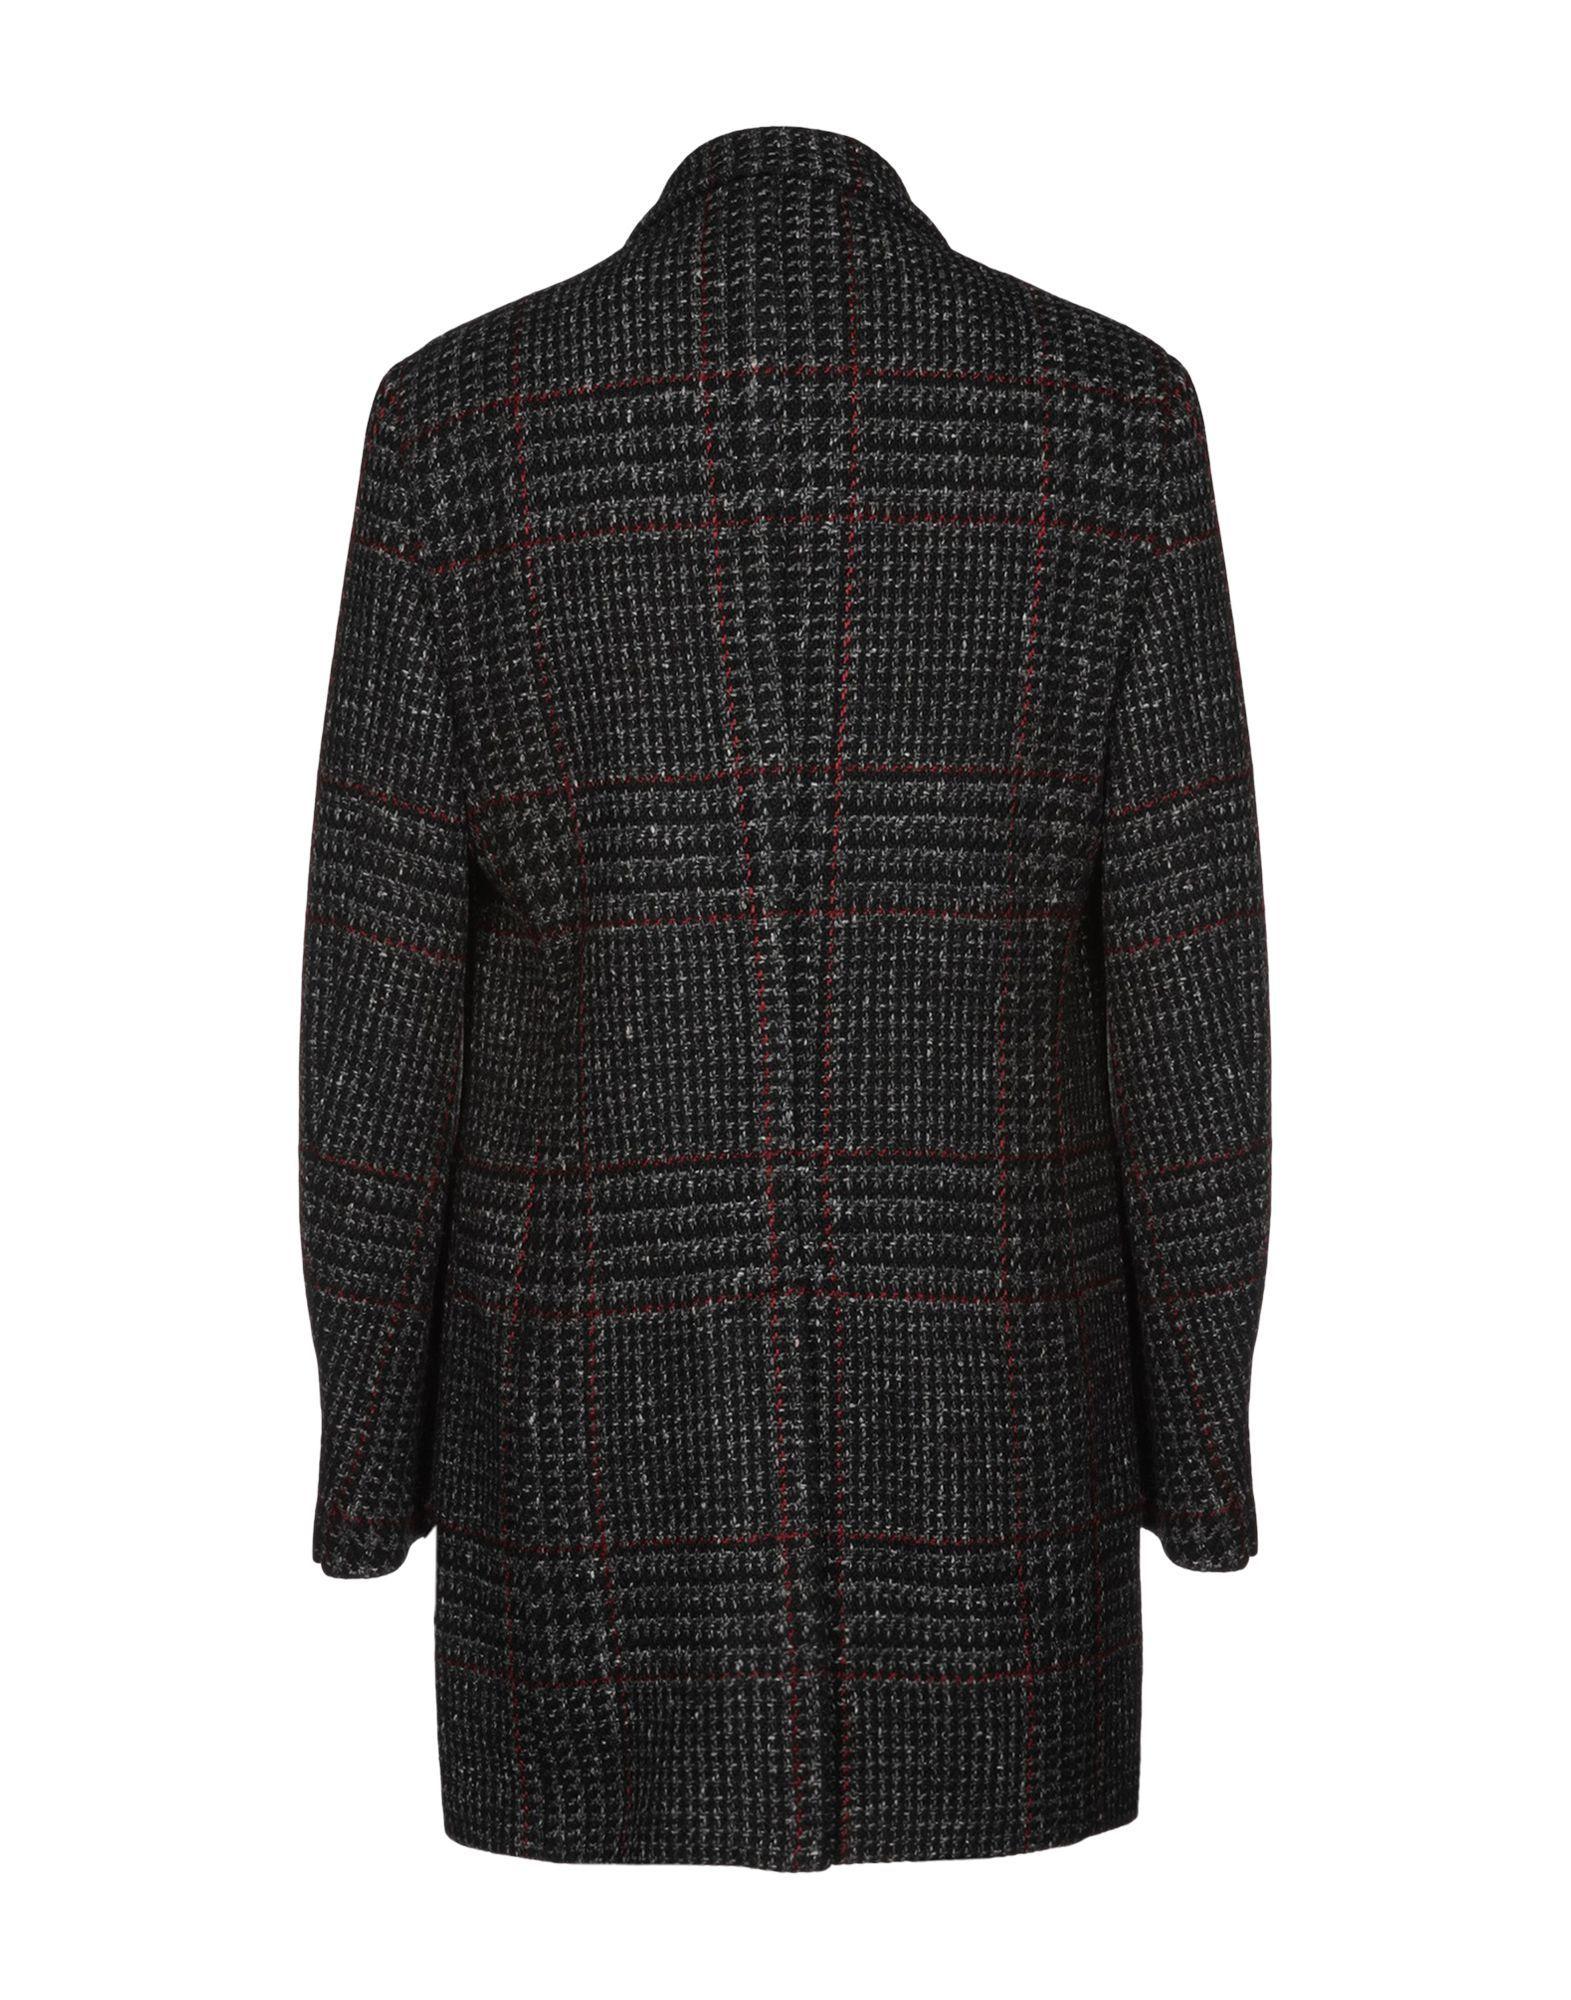 COATS & JACKETS Fay Black Man Wool